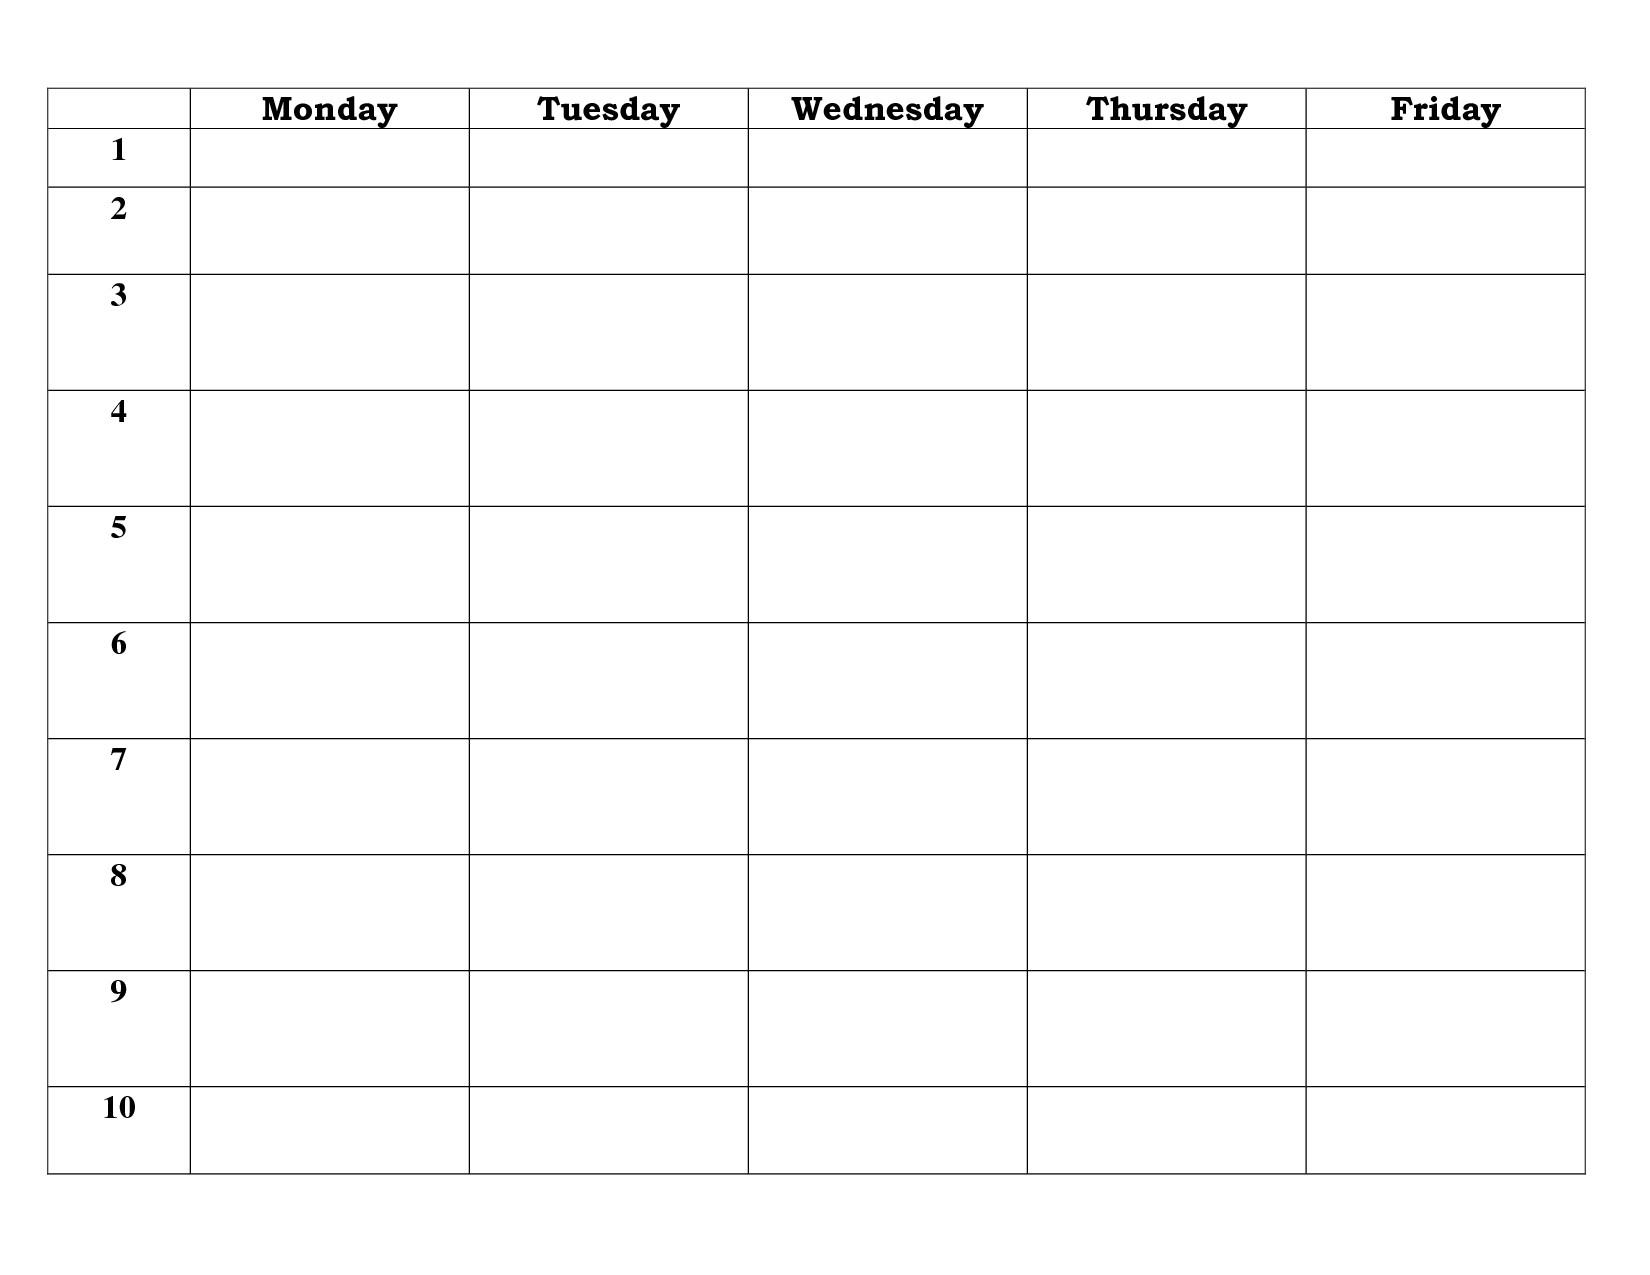 Blank Calendar Template 5 Day  Calendar Inspiration Design with 5 Day Calendar Template